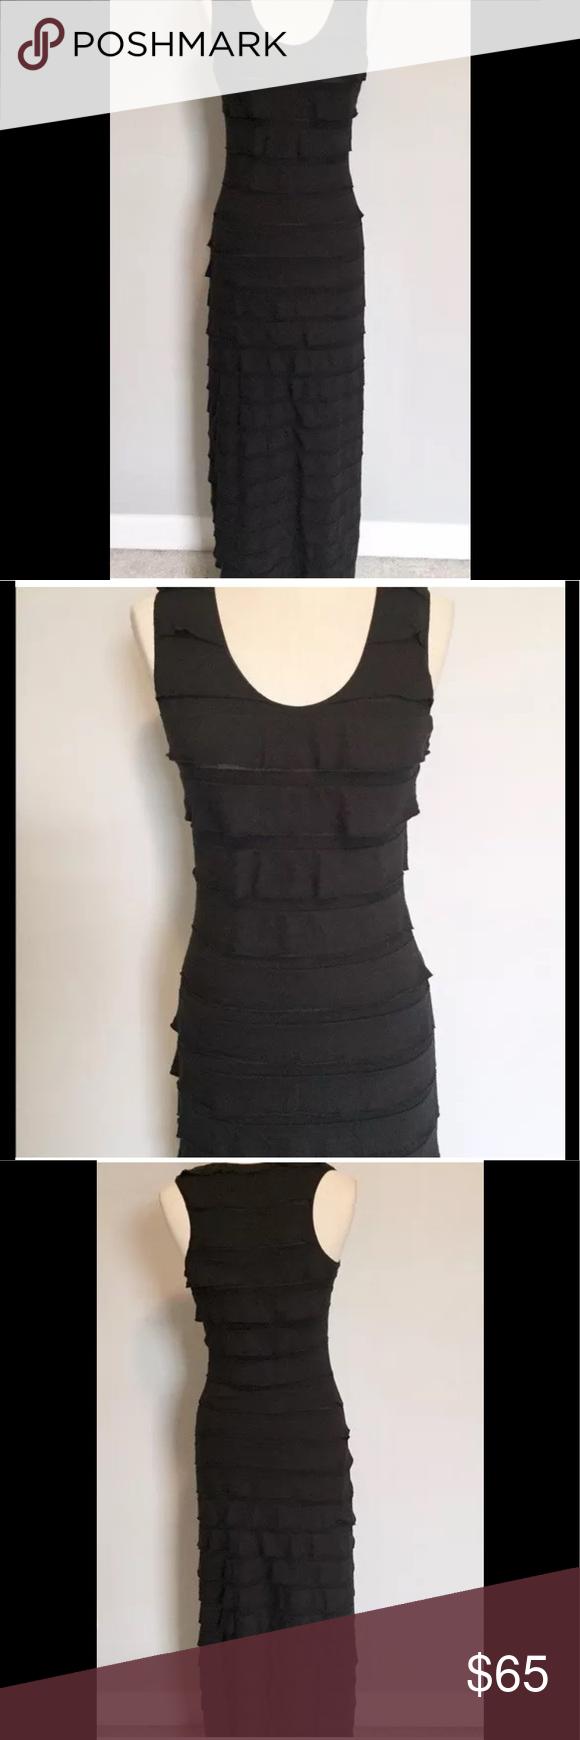 Max studio black scalloped fitted dress nwt black ruffle ruffle